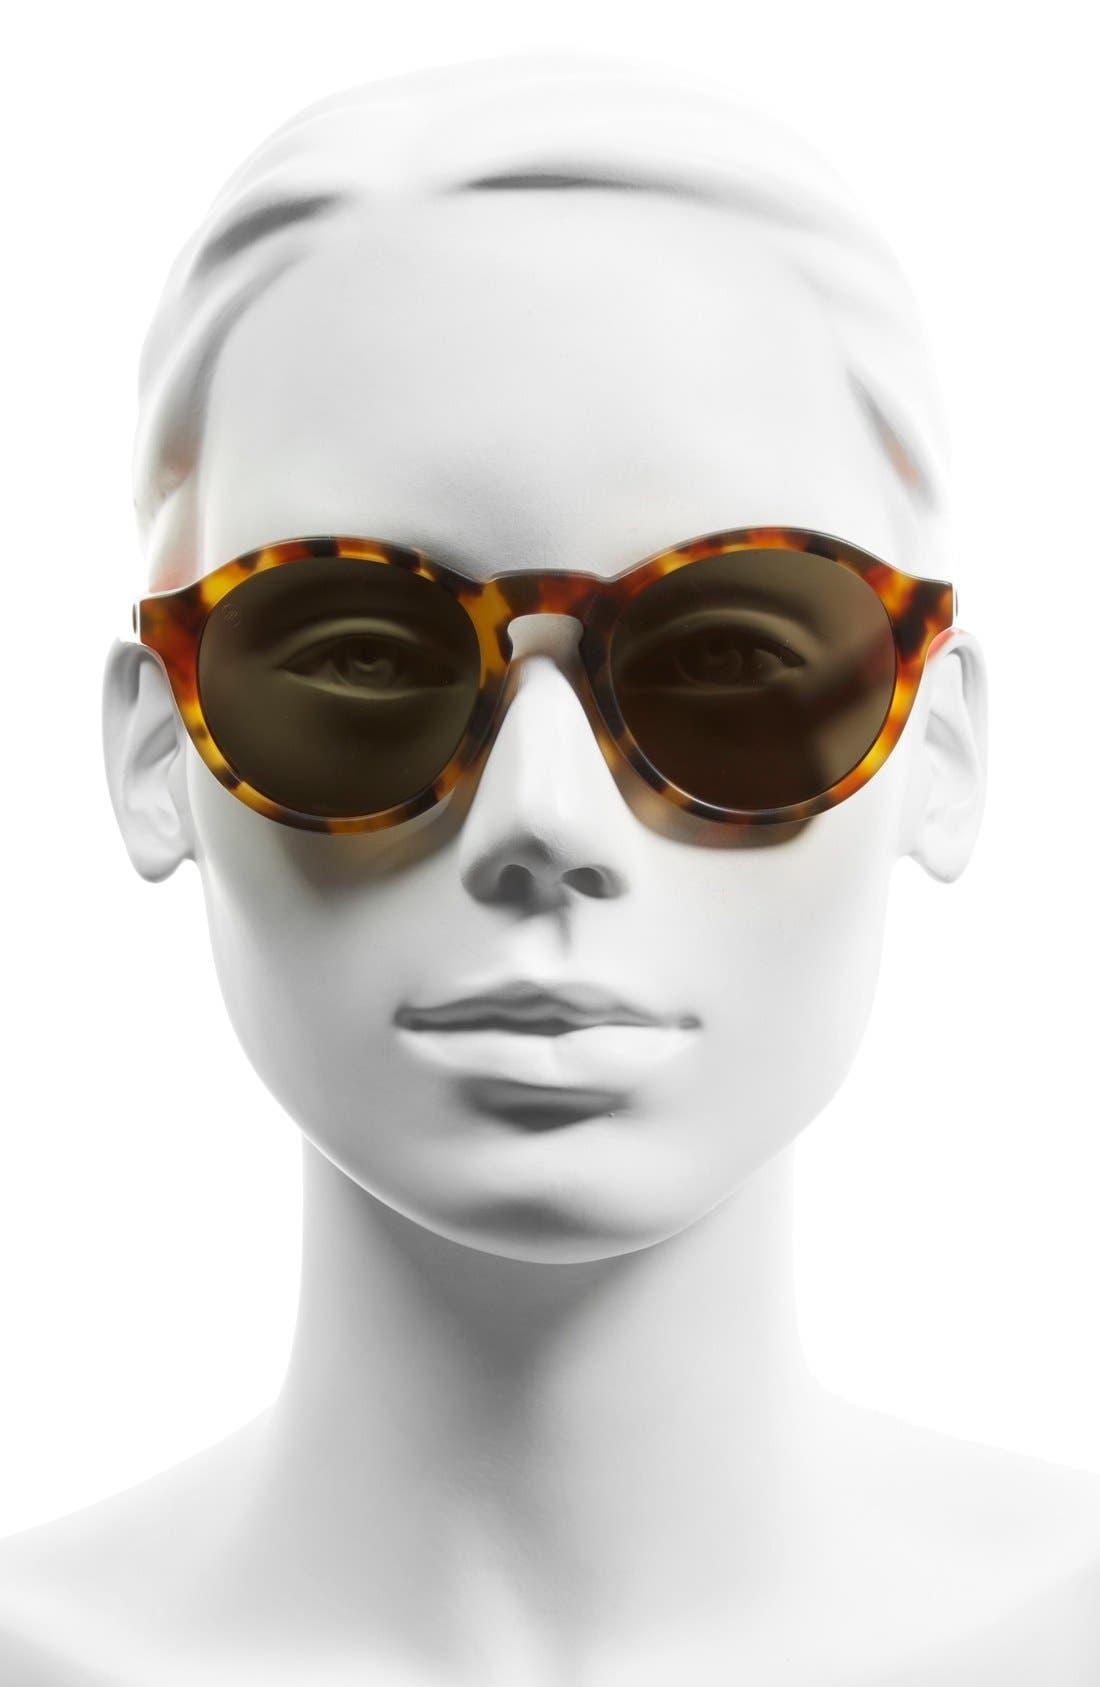 'Reprise' 50mm Round Sunglasses,                             Alternate thumbnail 2, color,                             Matte Coral Tortoise/ Grey